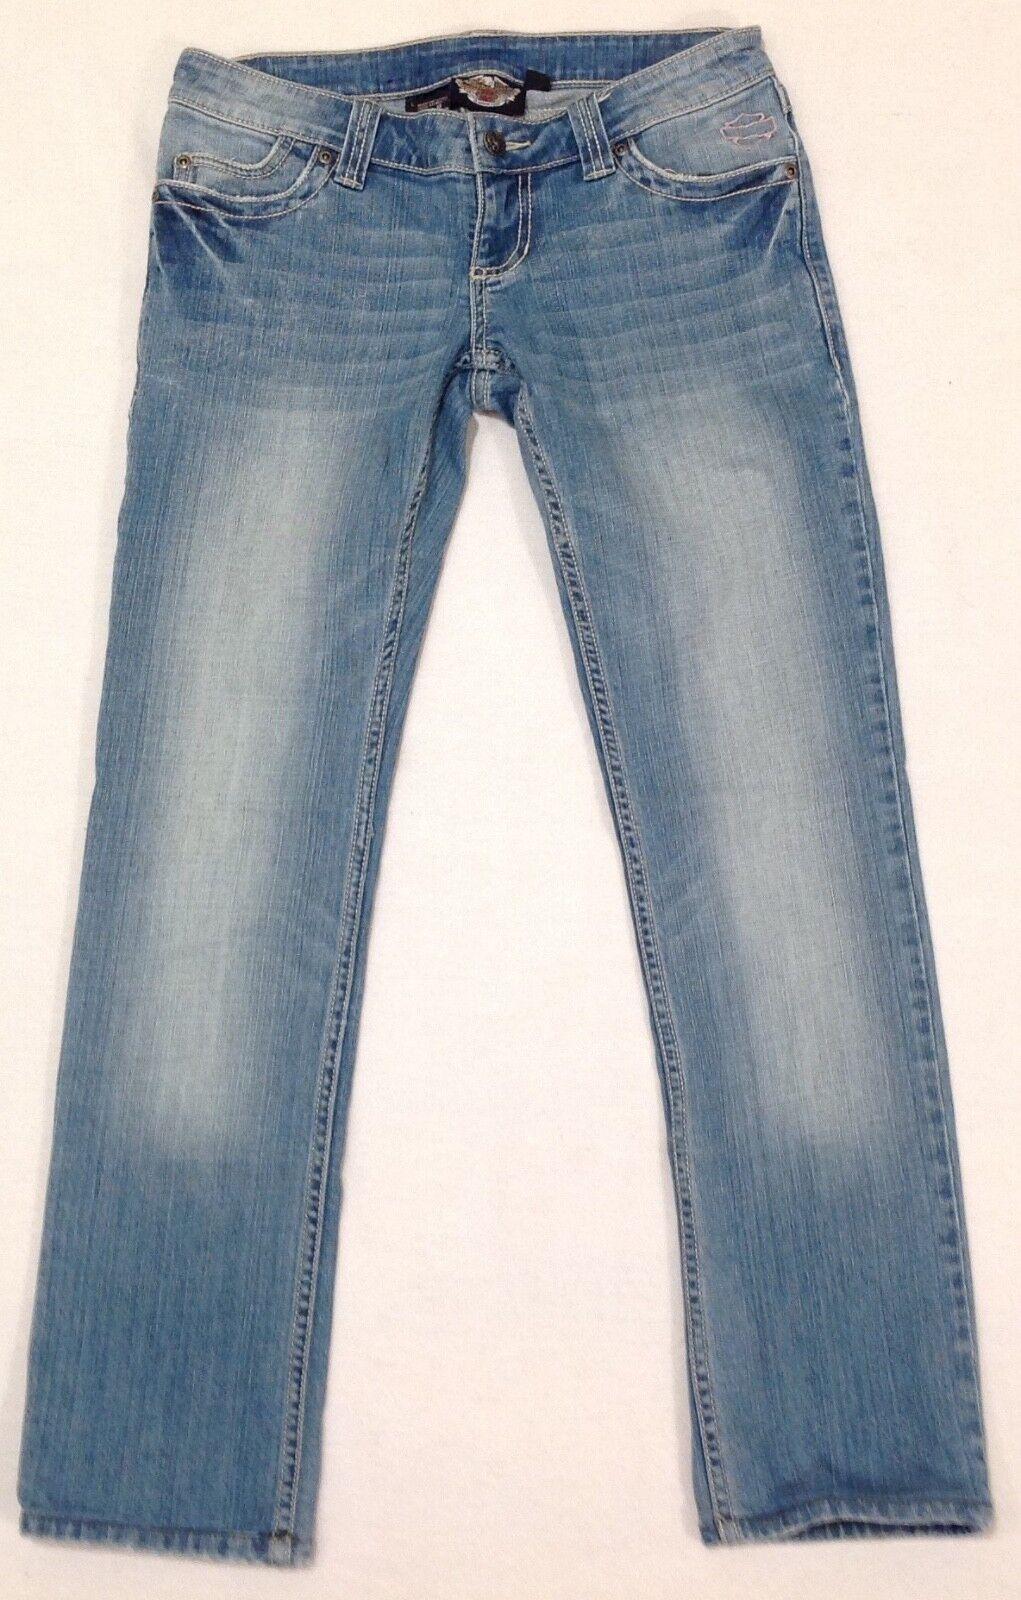 Harley Davidson Rhinestone Straight Leg Ultra-Low Rise bluee Jeans Size 2 30X29